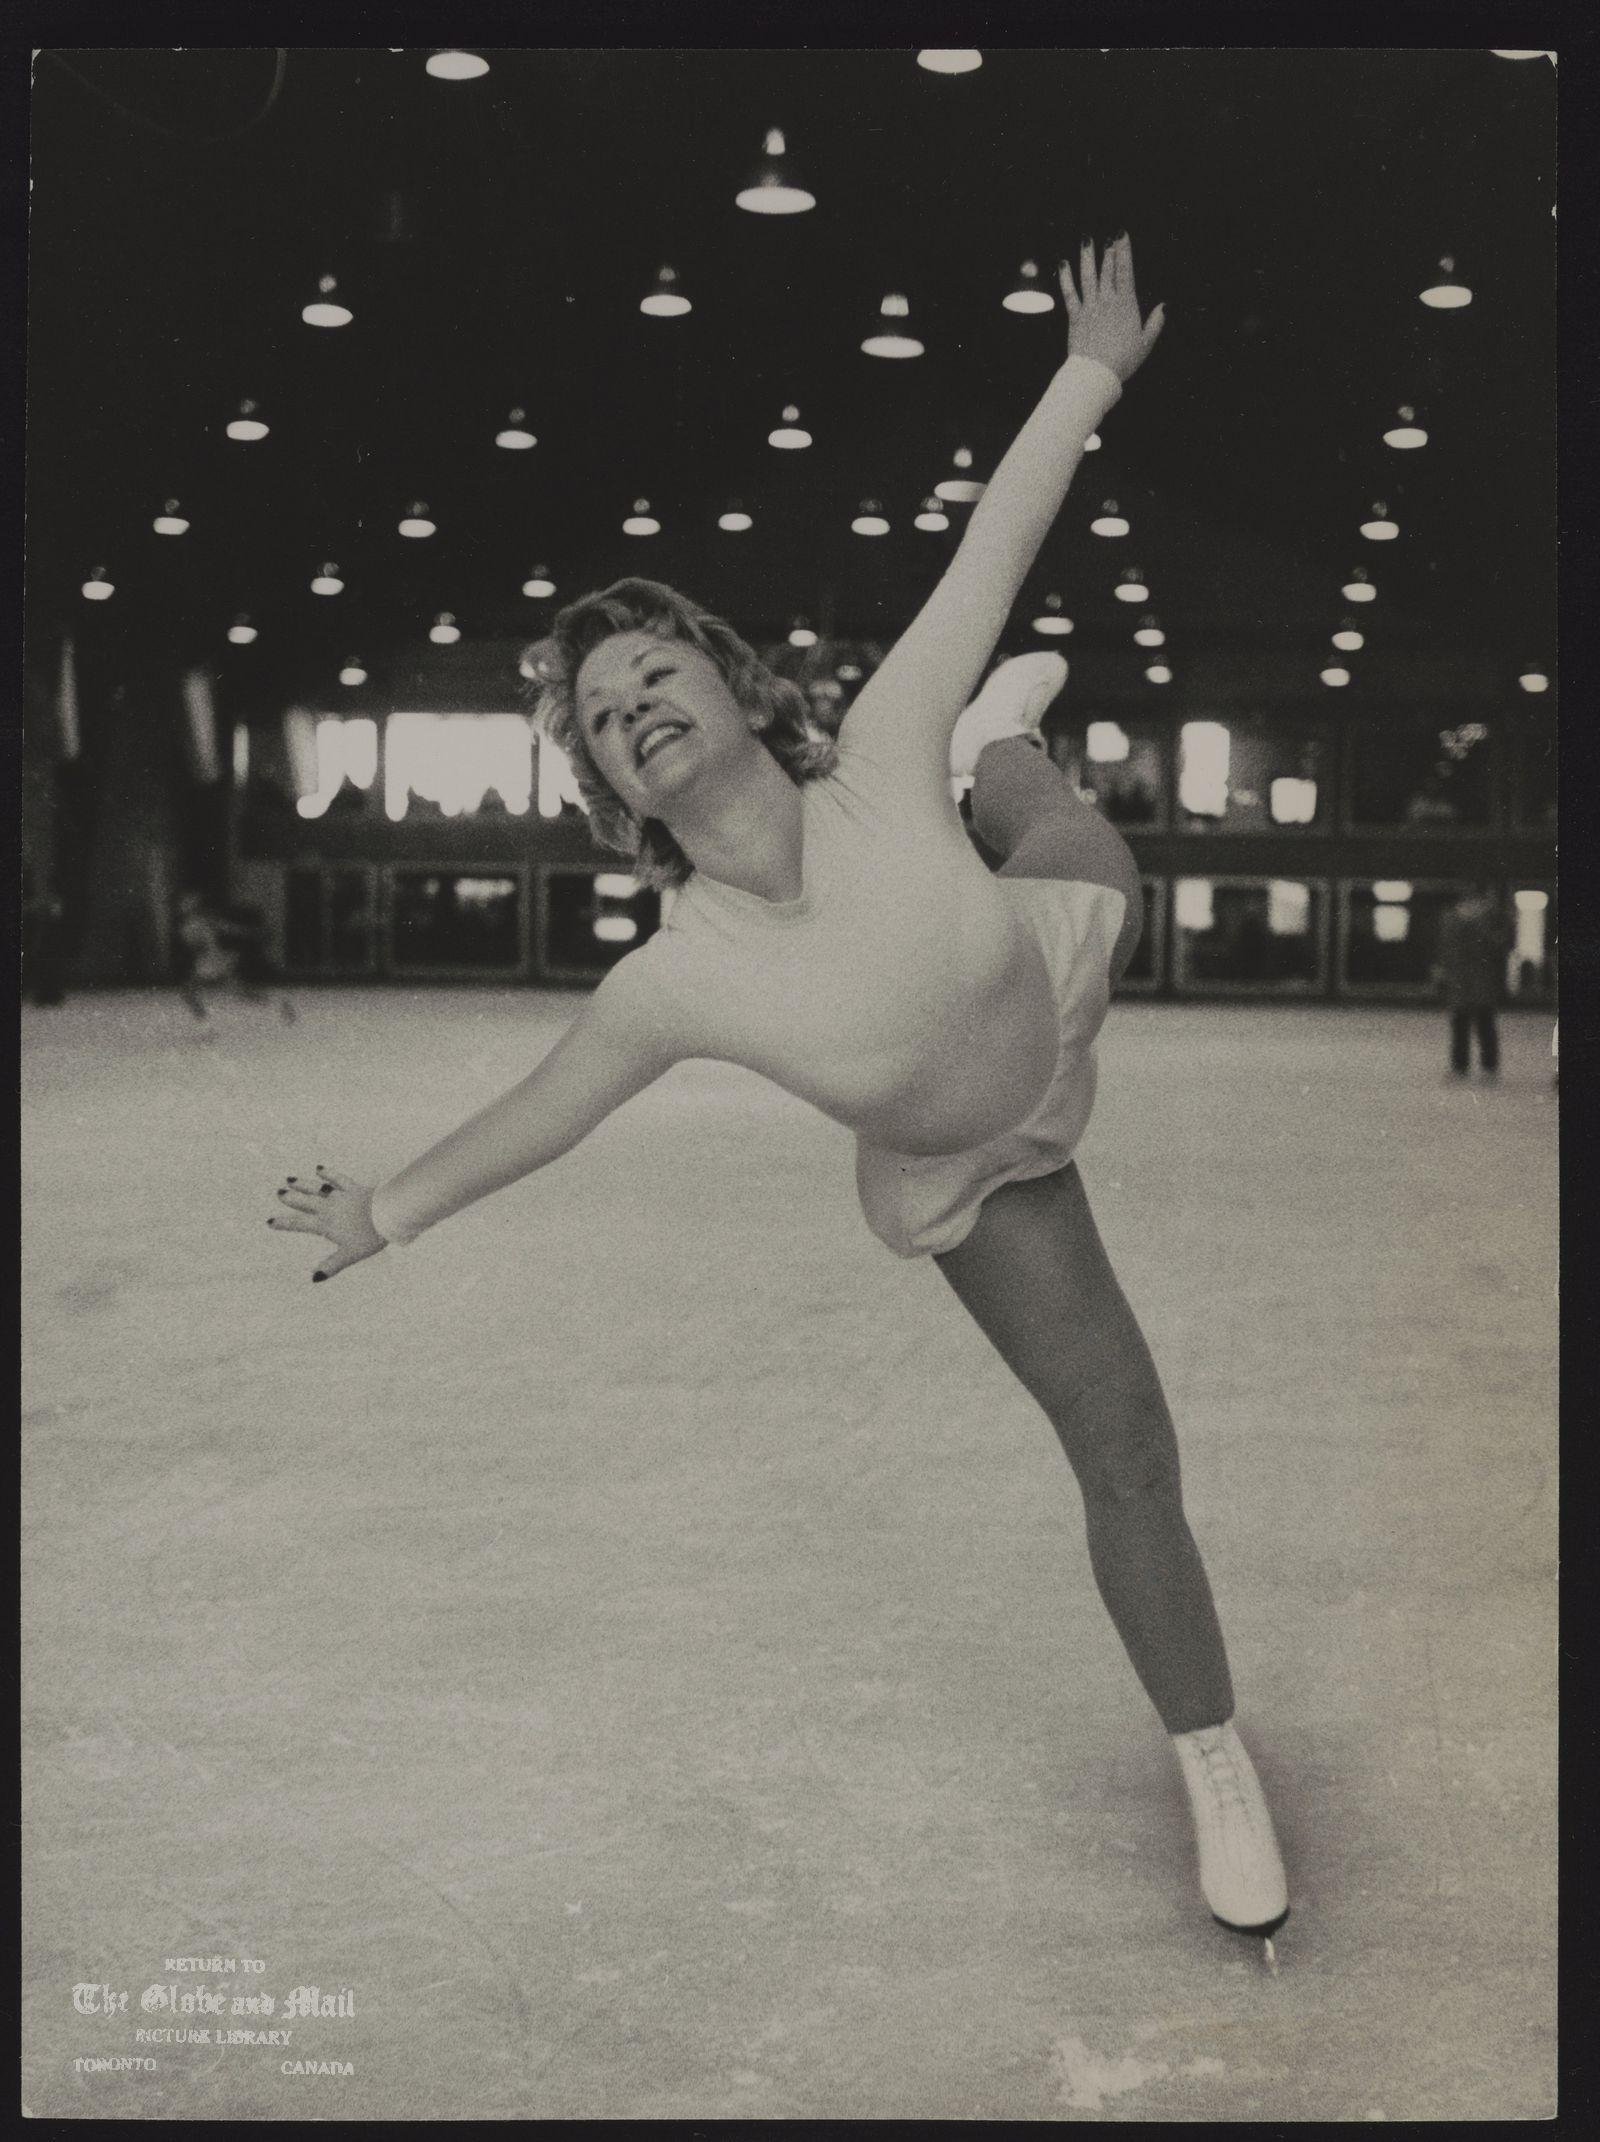 Karen MAGNUSSEN Vancouver. Skater